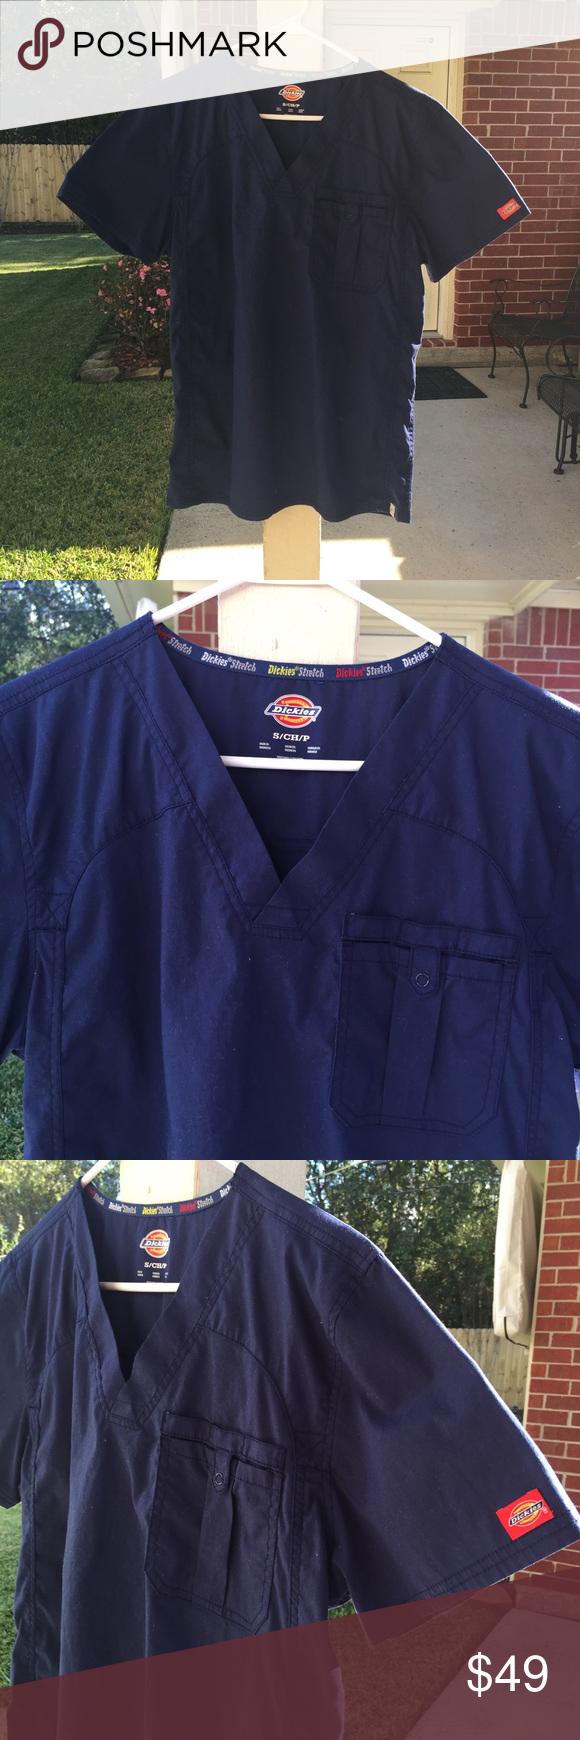 NEW Dickies blue nursing scrub uniform small PS Brand New